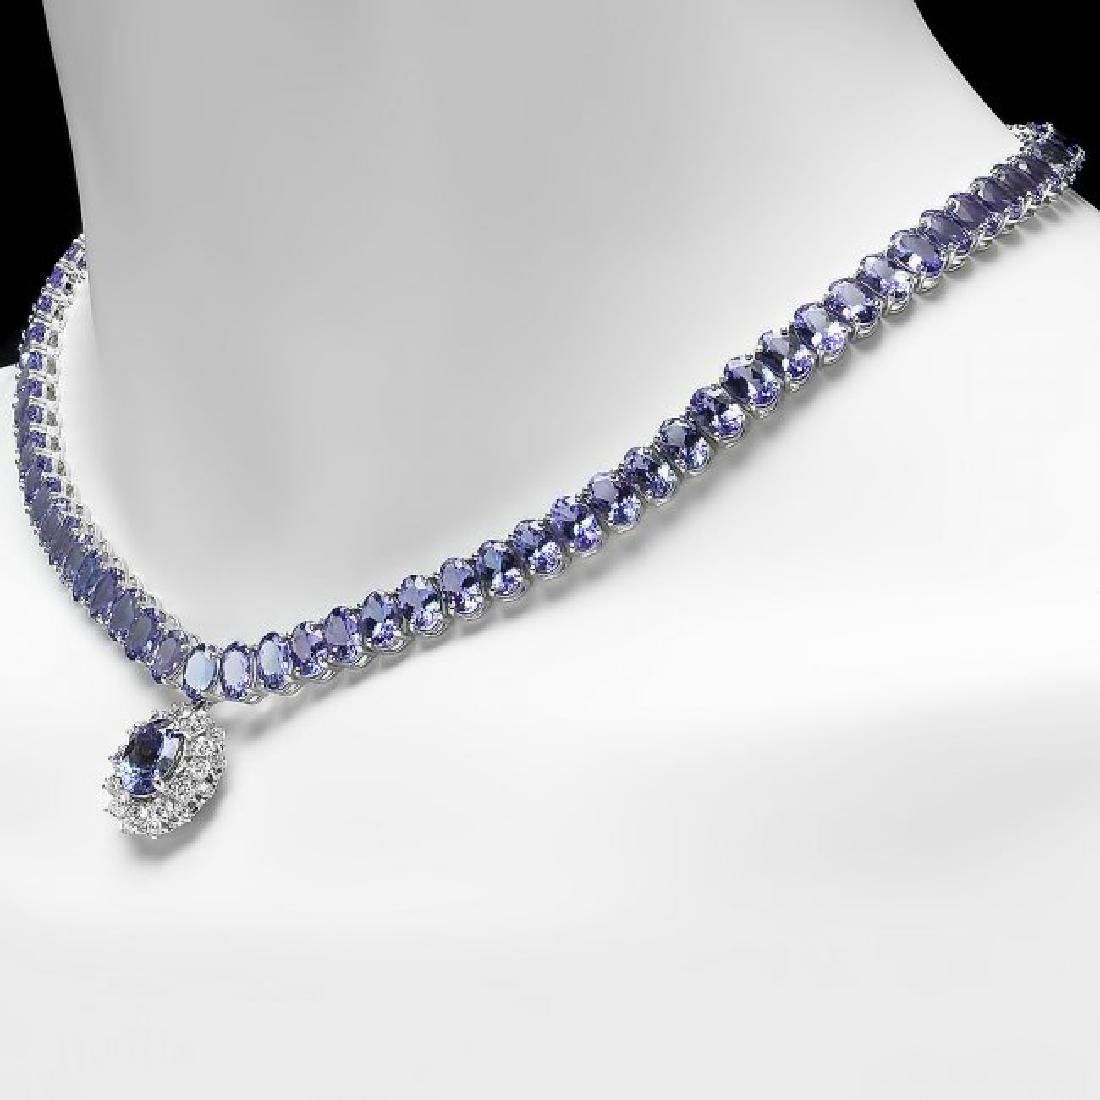 14k Gold 64.5ct Tanzanite 1.60ct Diamond Necklace - 5